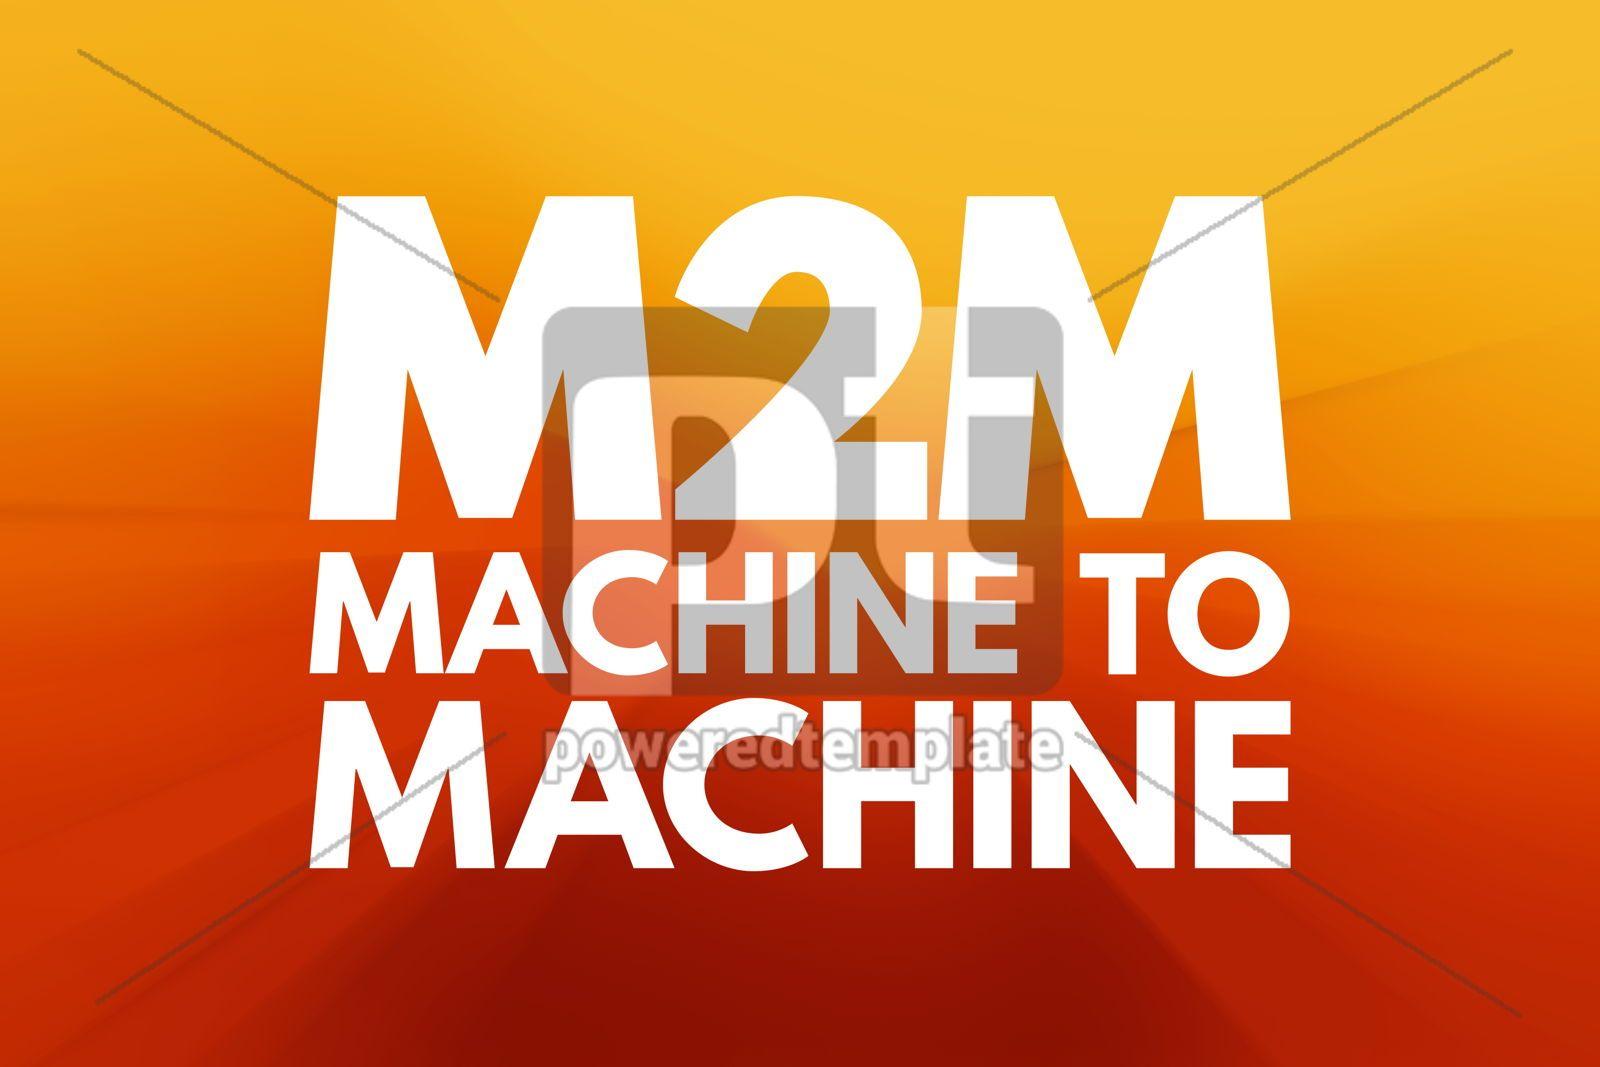 M2M - Machine to Machine acronym technology concept background, 16190, Business — PoweredTemplate.com